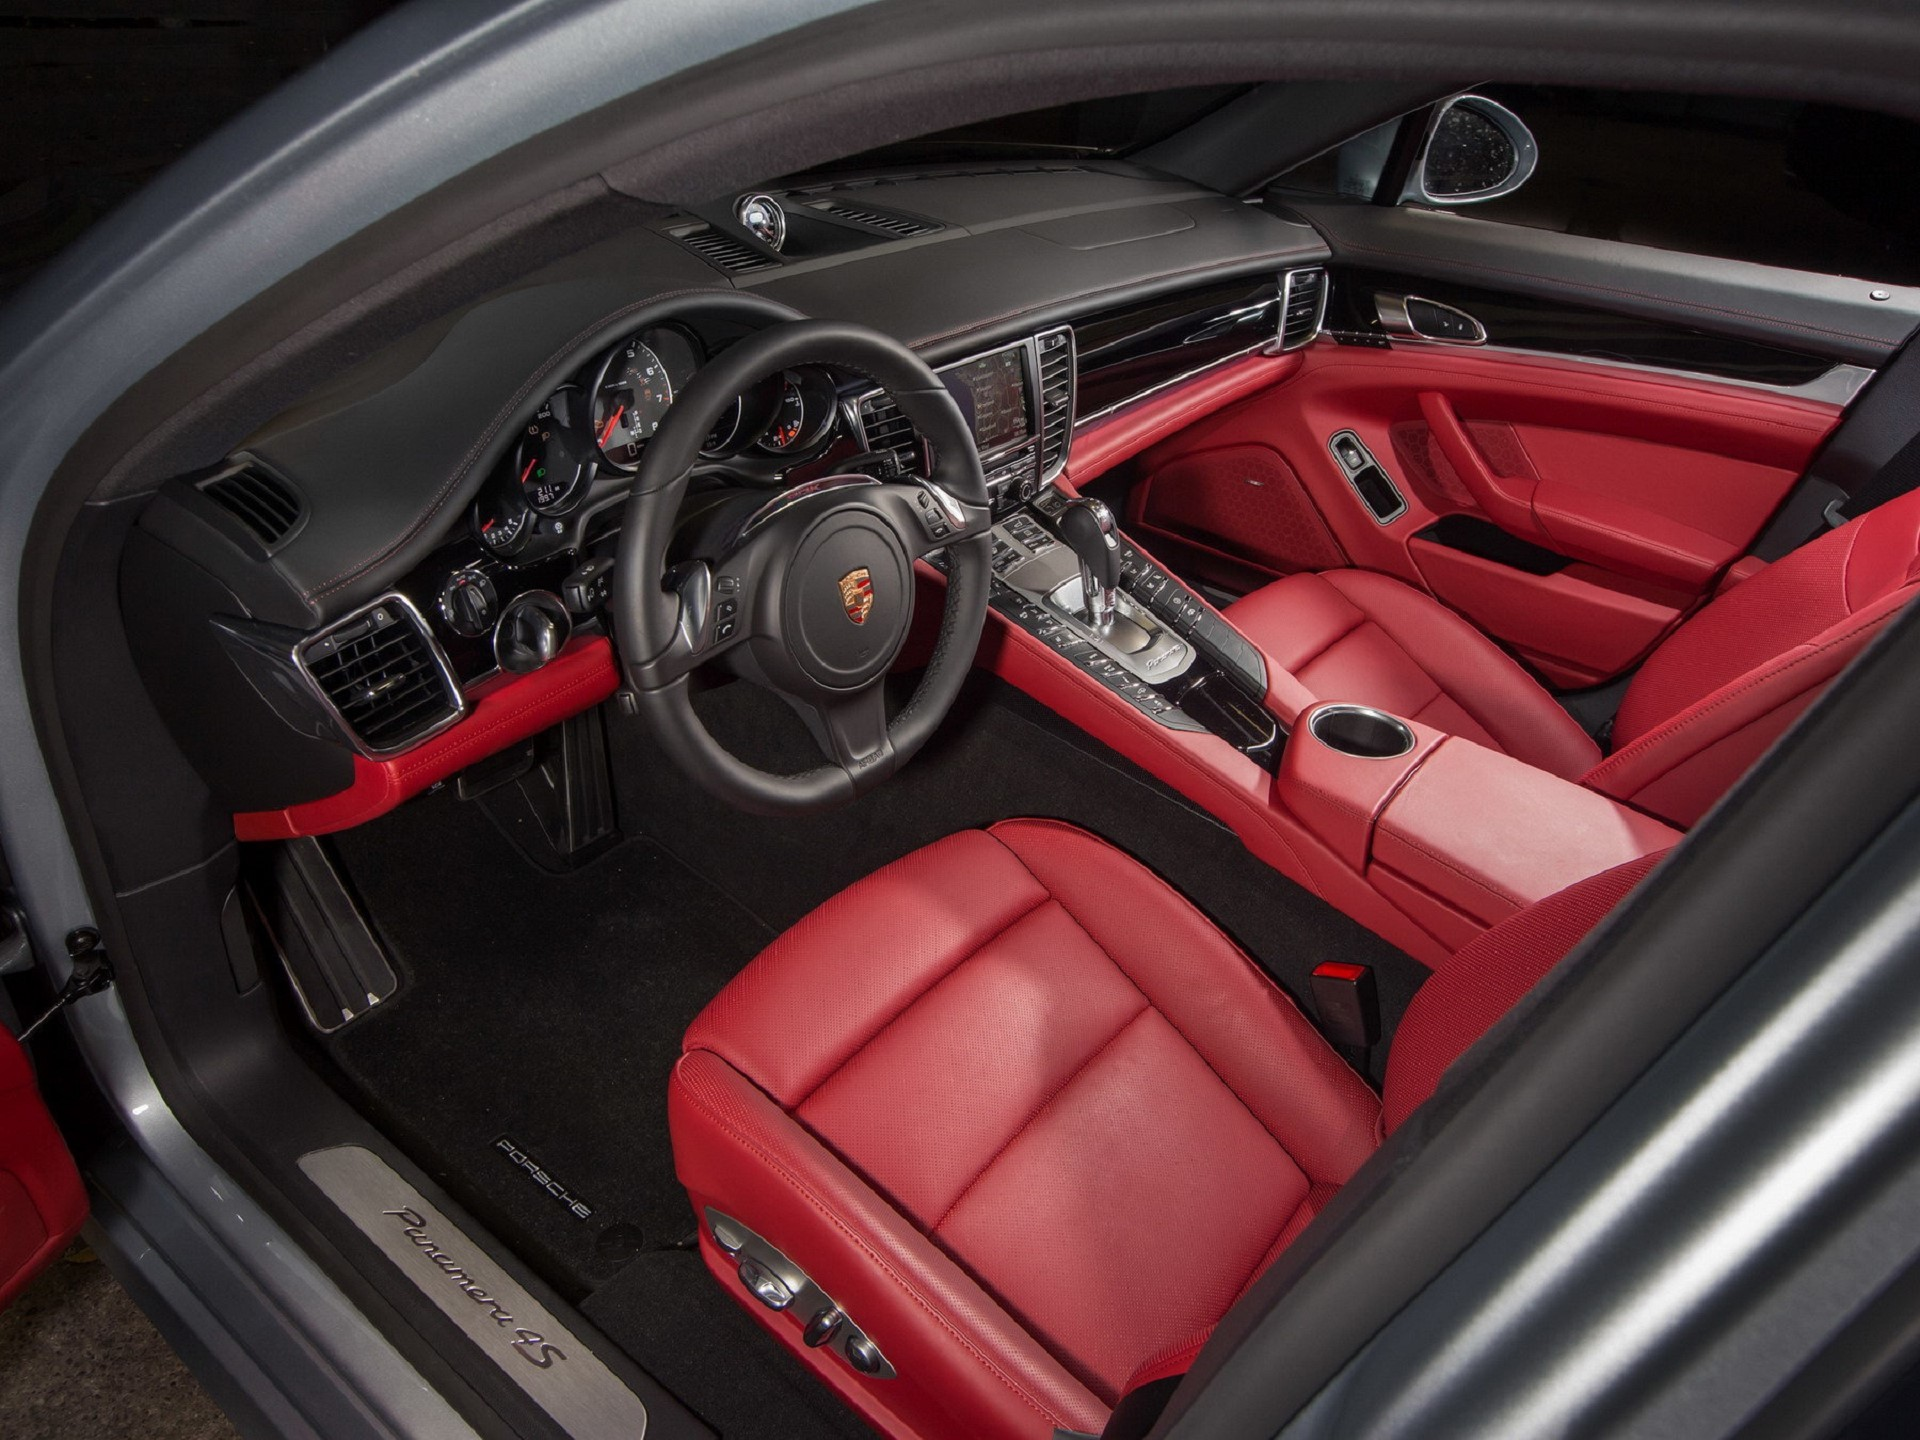 Porsche Panamera Wallpapers 5